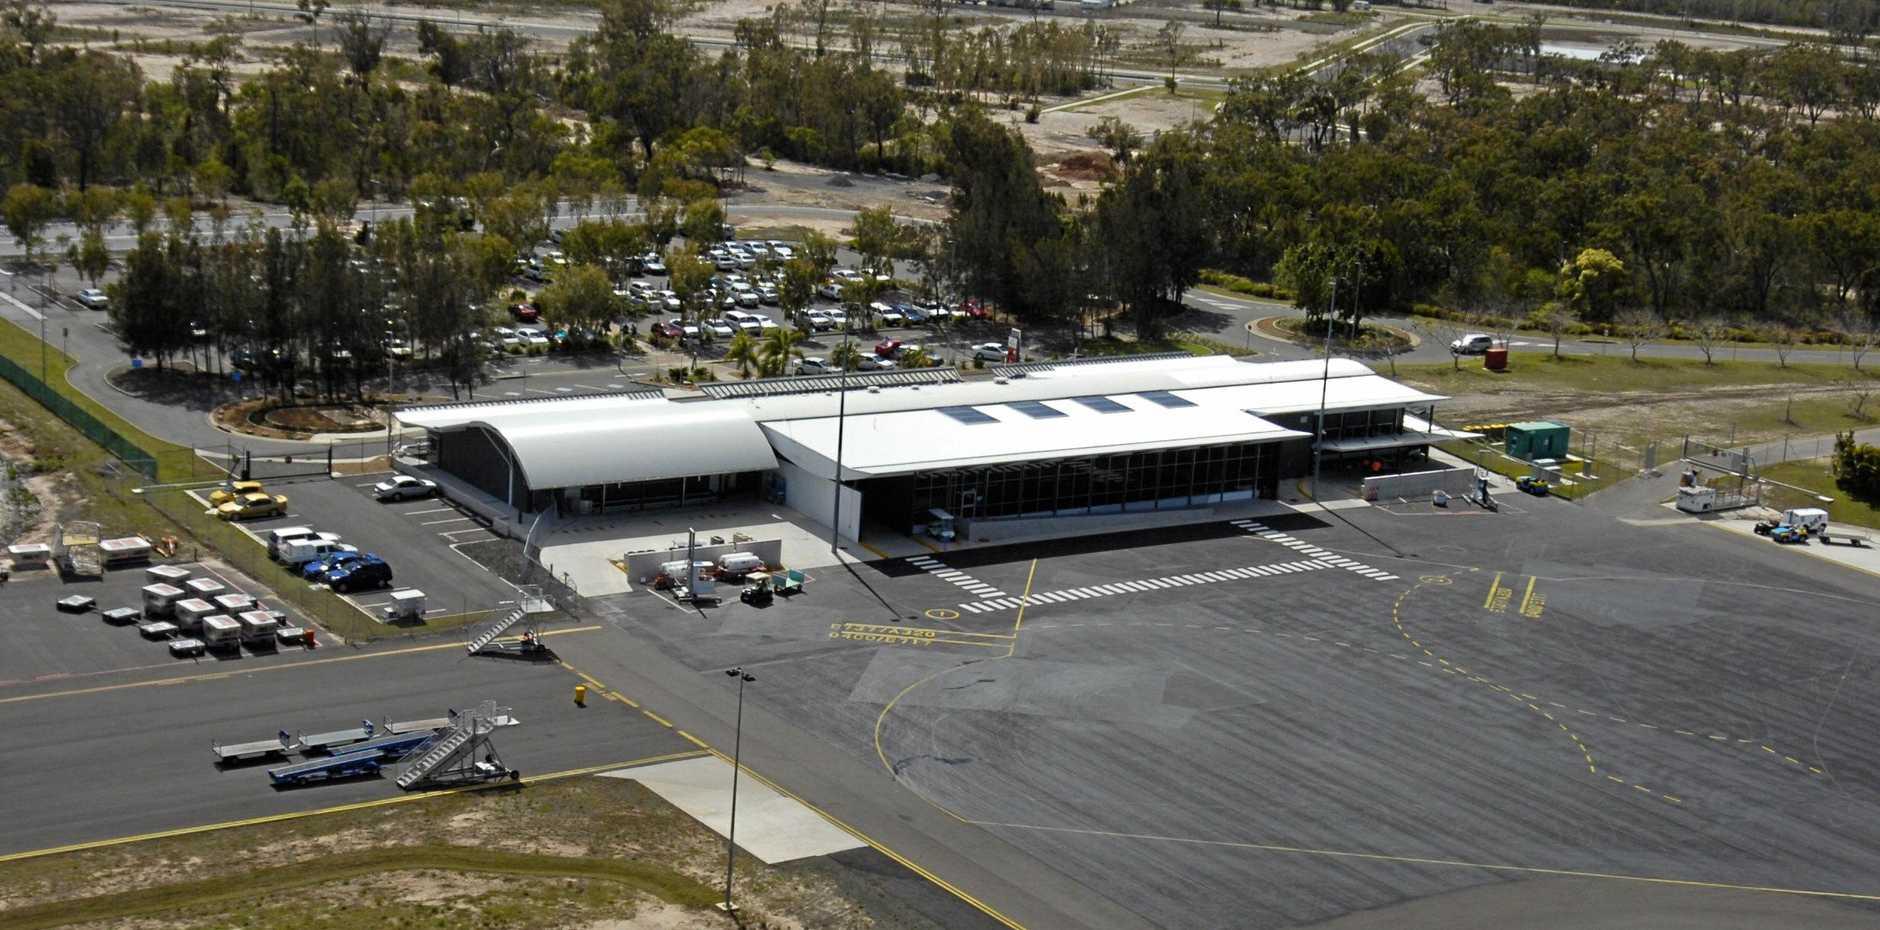 Aerials - Hervey Bay - Airport.Photo: ALISTAIR BRIGHTMAN 07h2219v